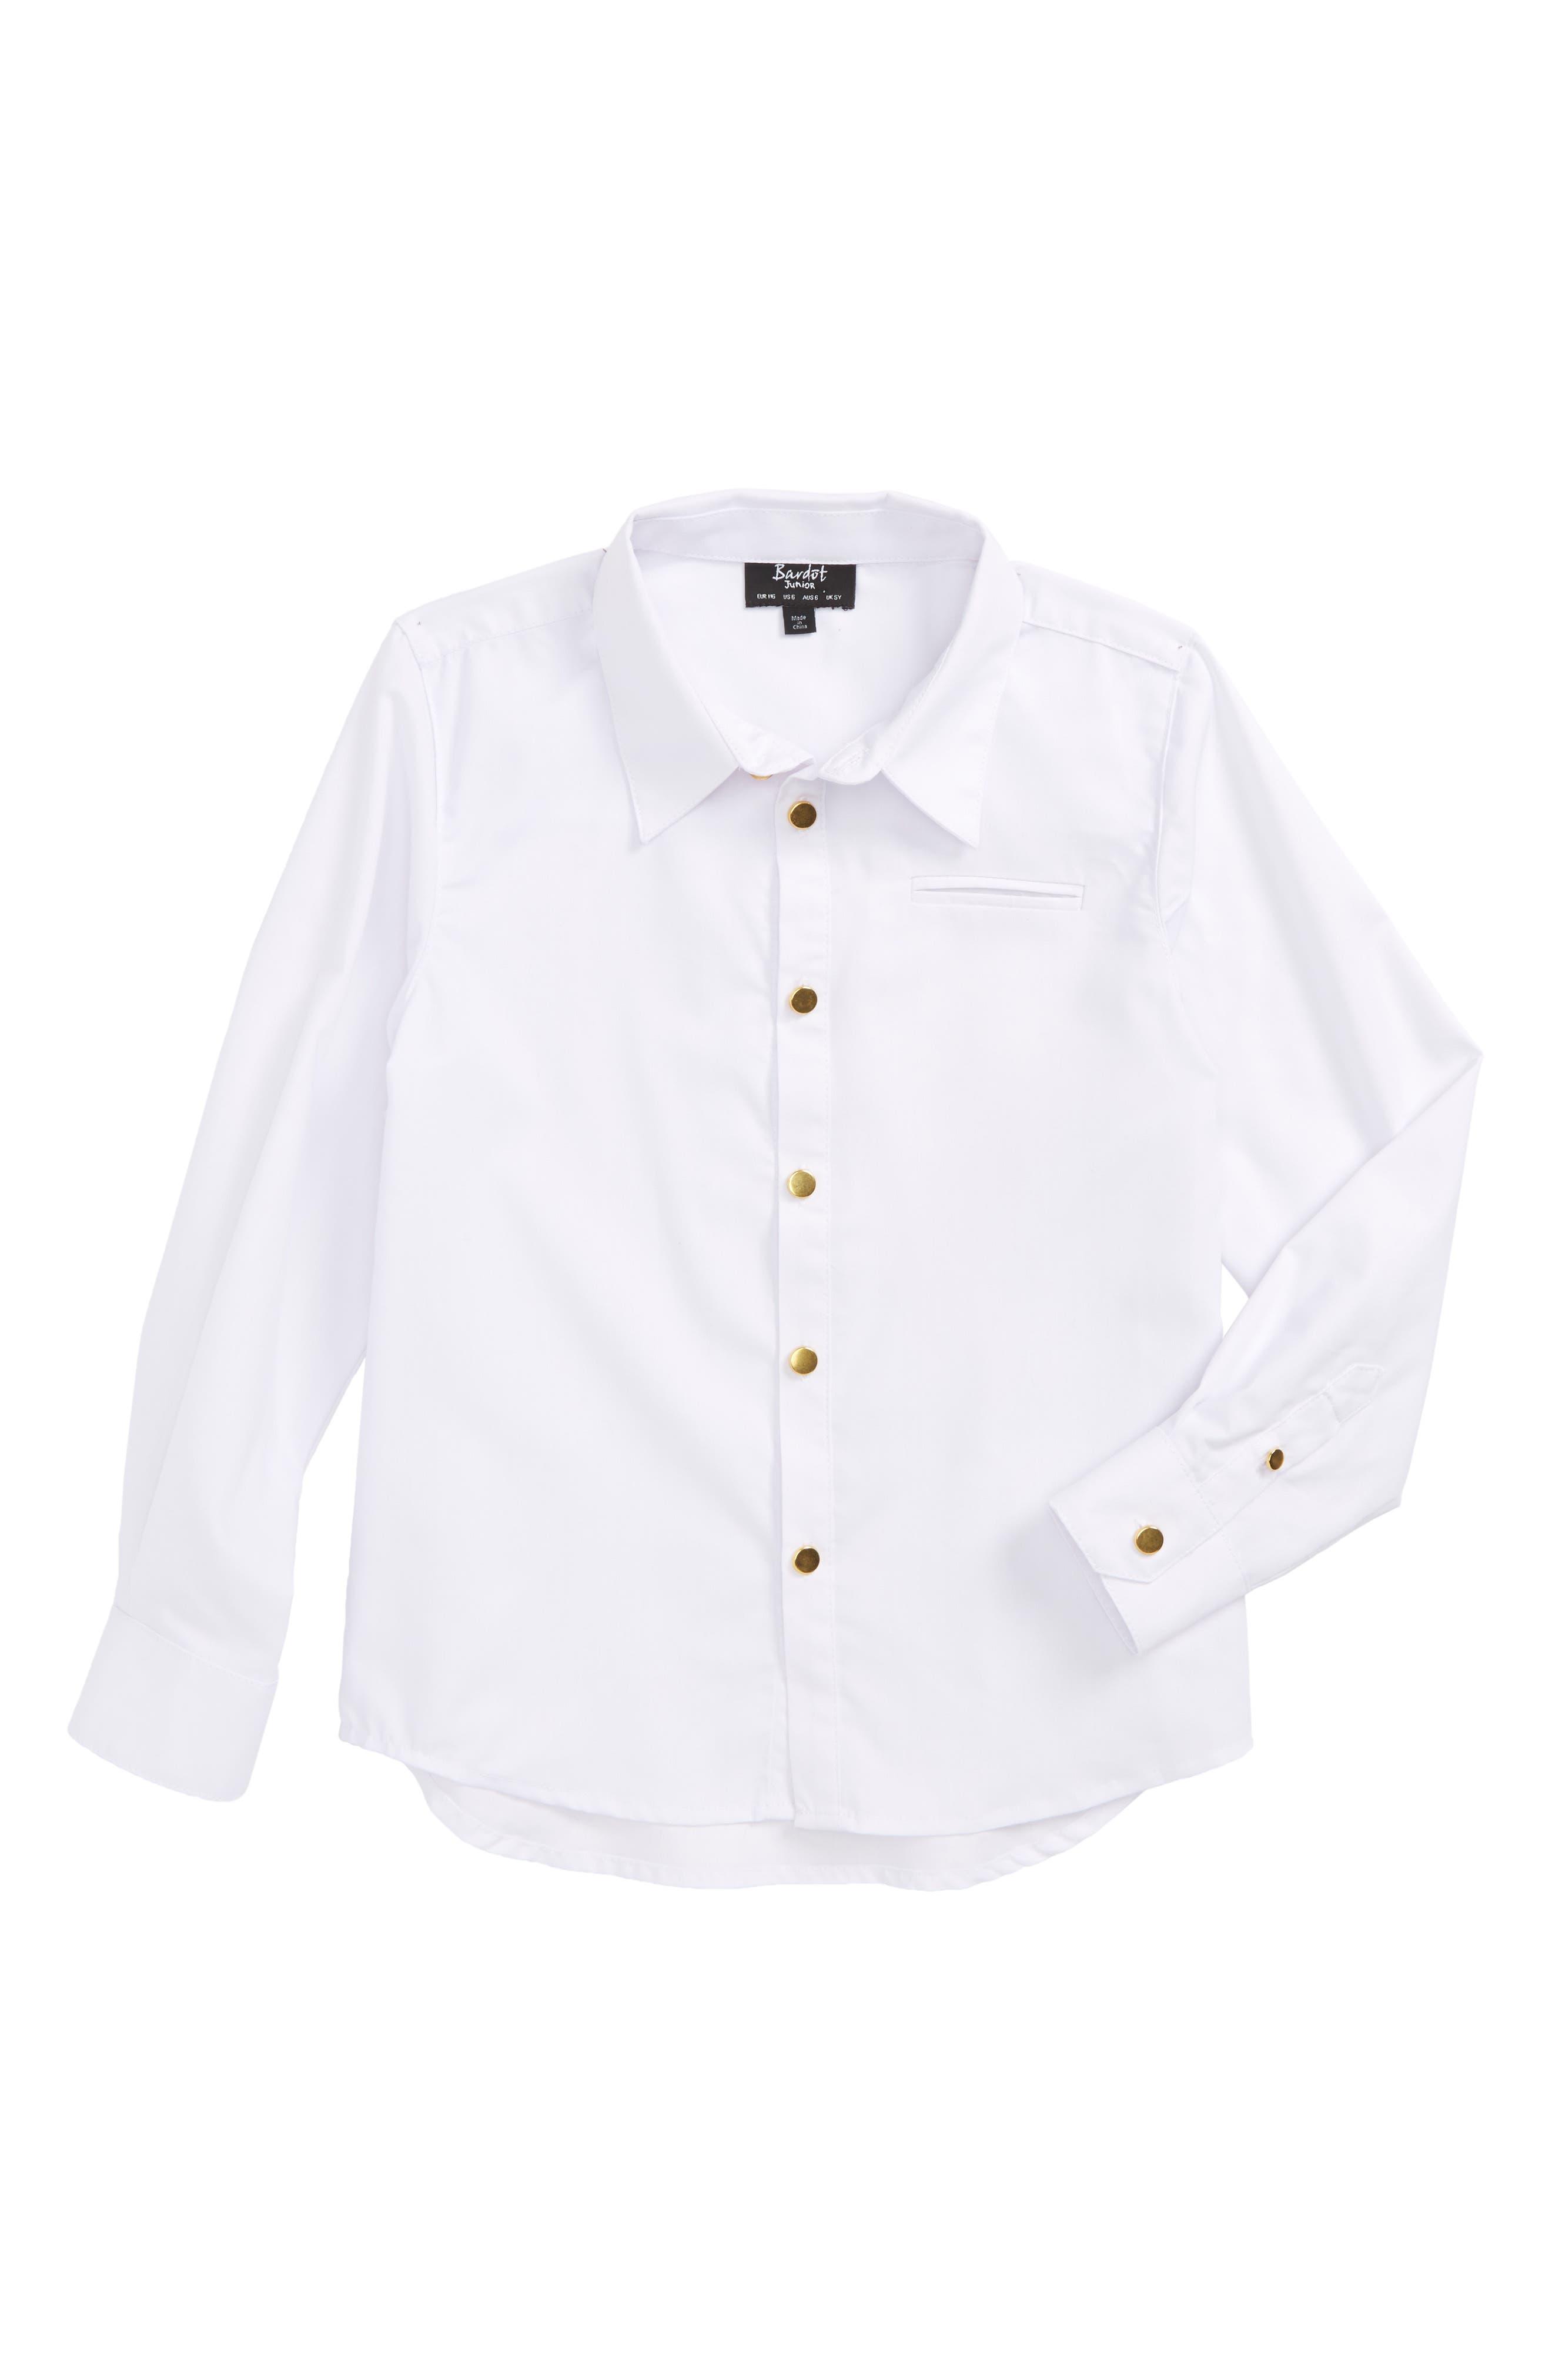 BARDOT JUNIOR,                             Goldtone Button Shirt,                             Main thumbnail 1, color,                             100